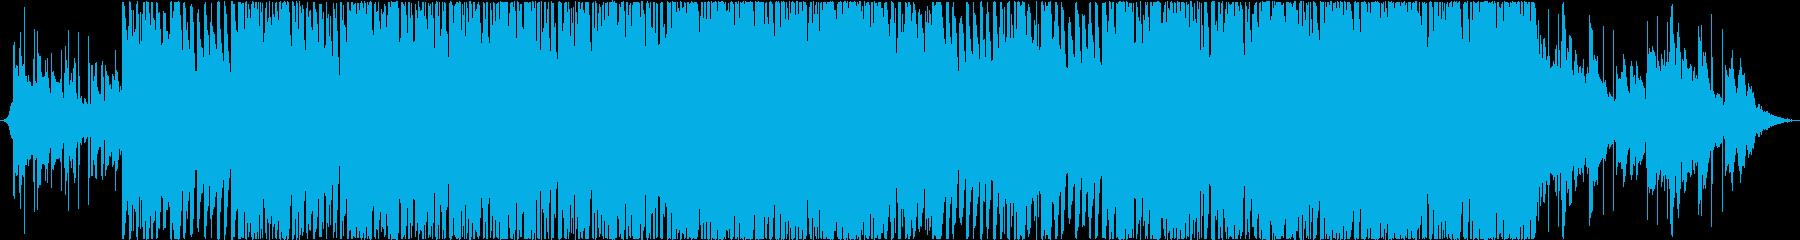 popの再生済みの波形